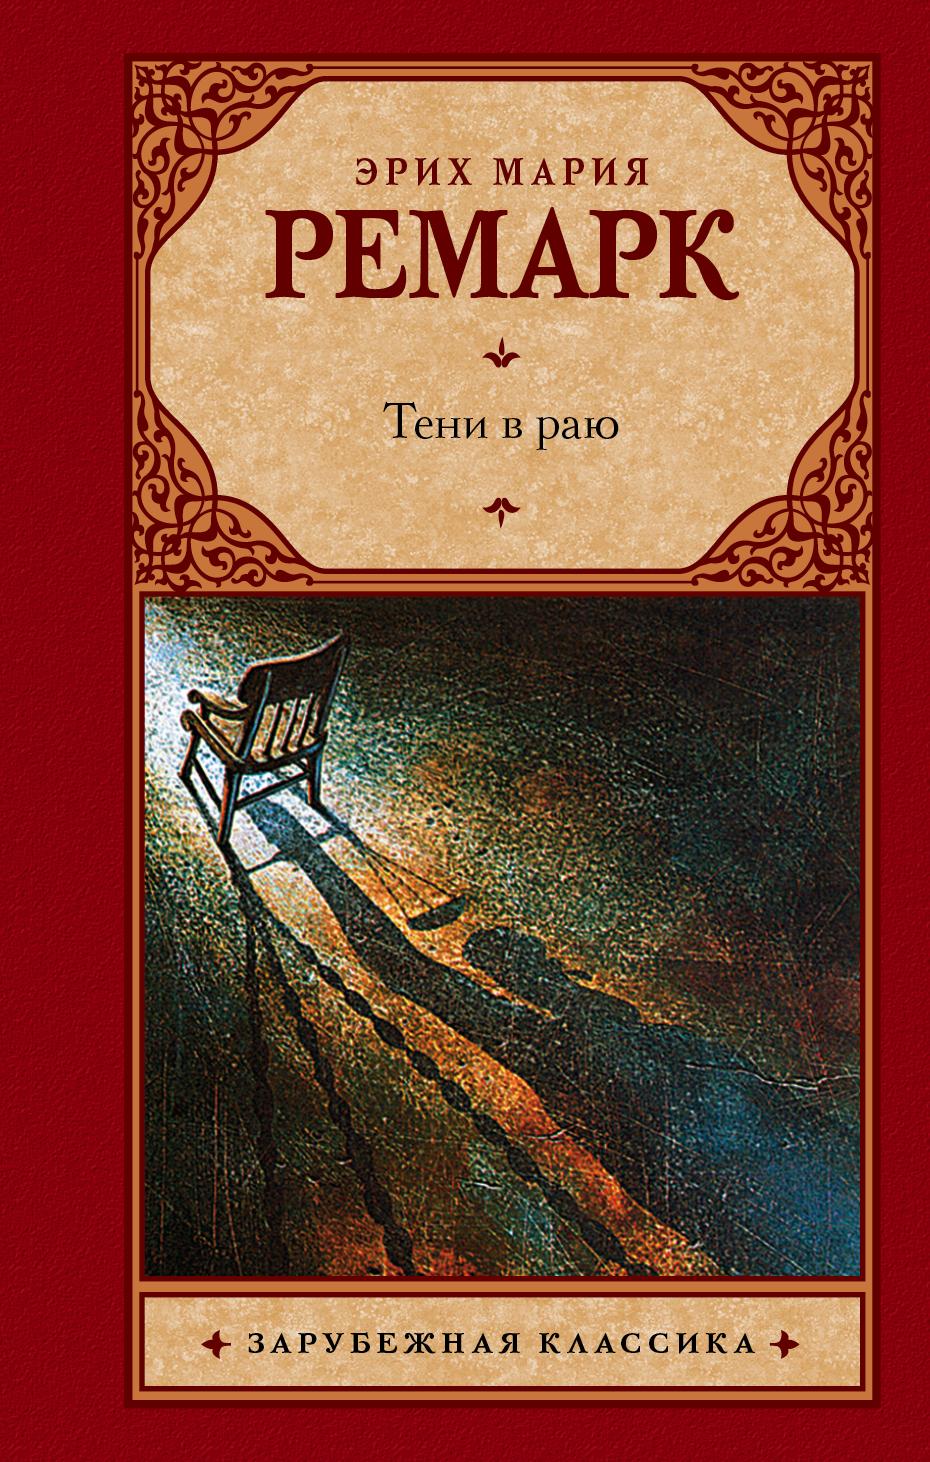 Ремарк Эрих Мария Тени в раю тени в раю